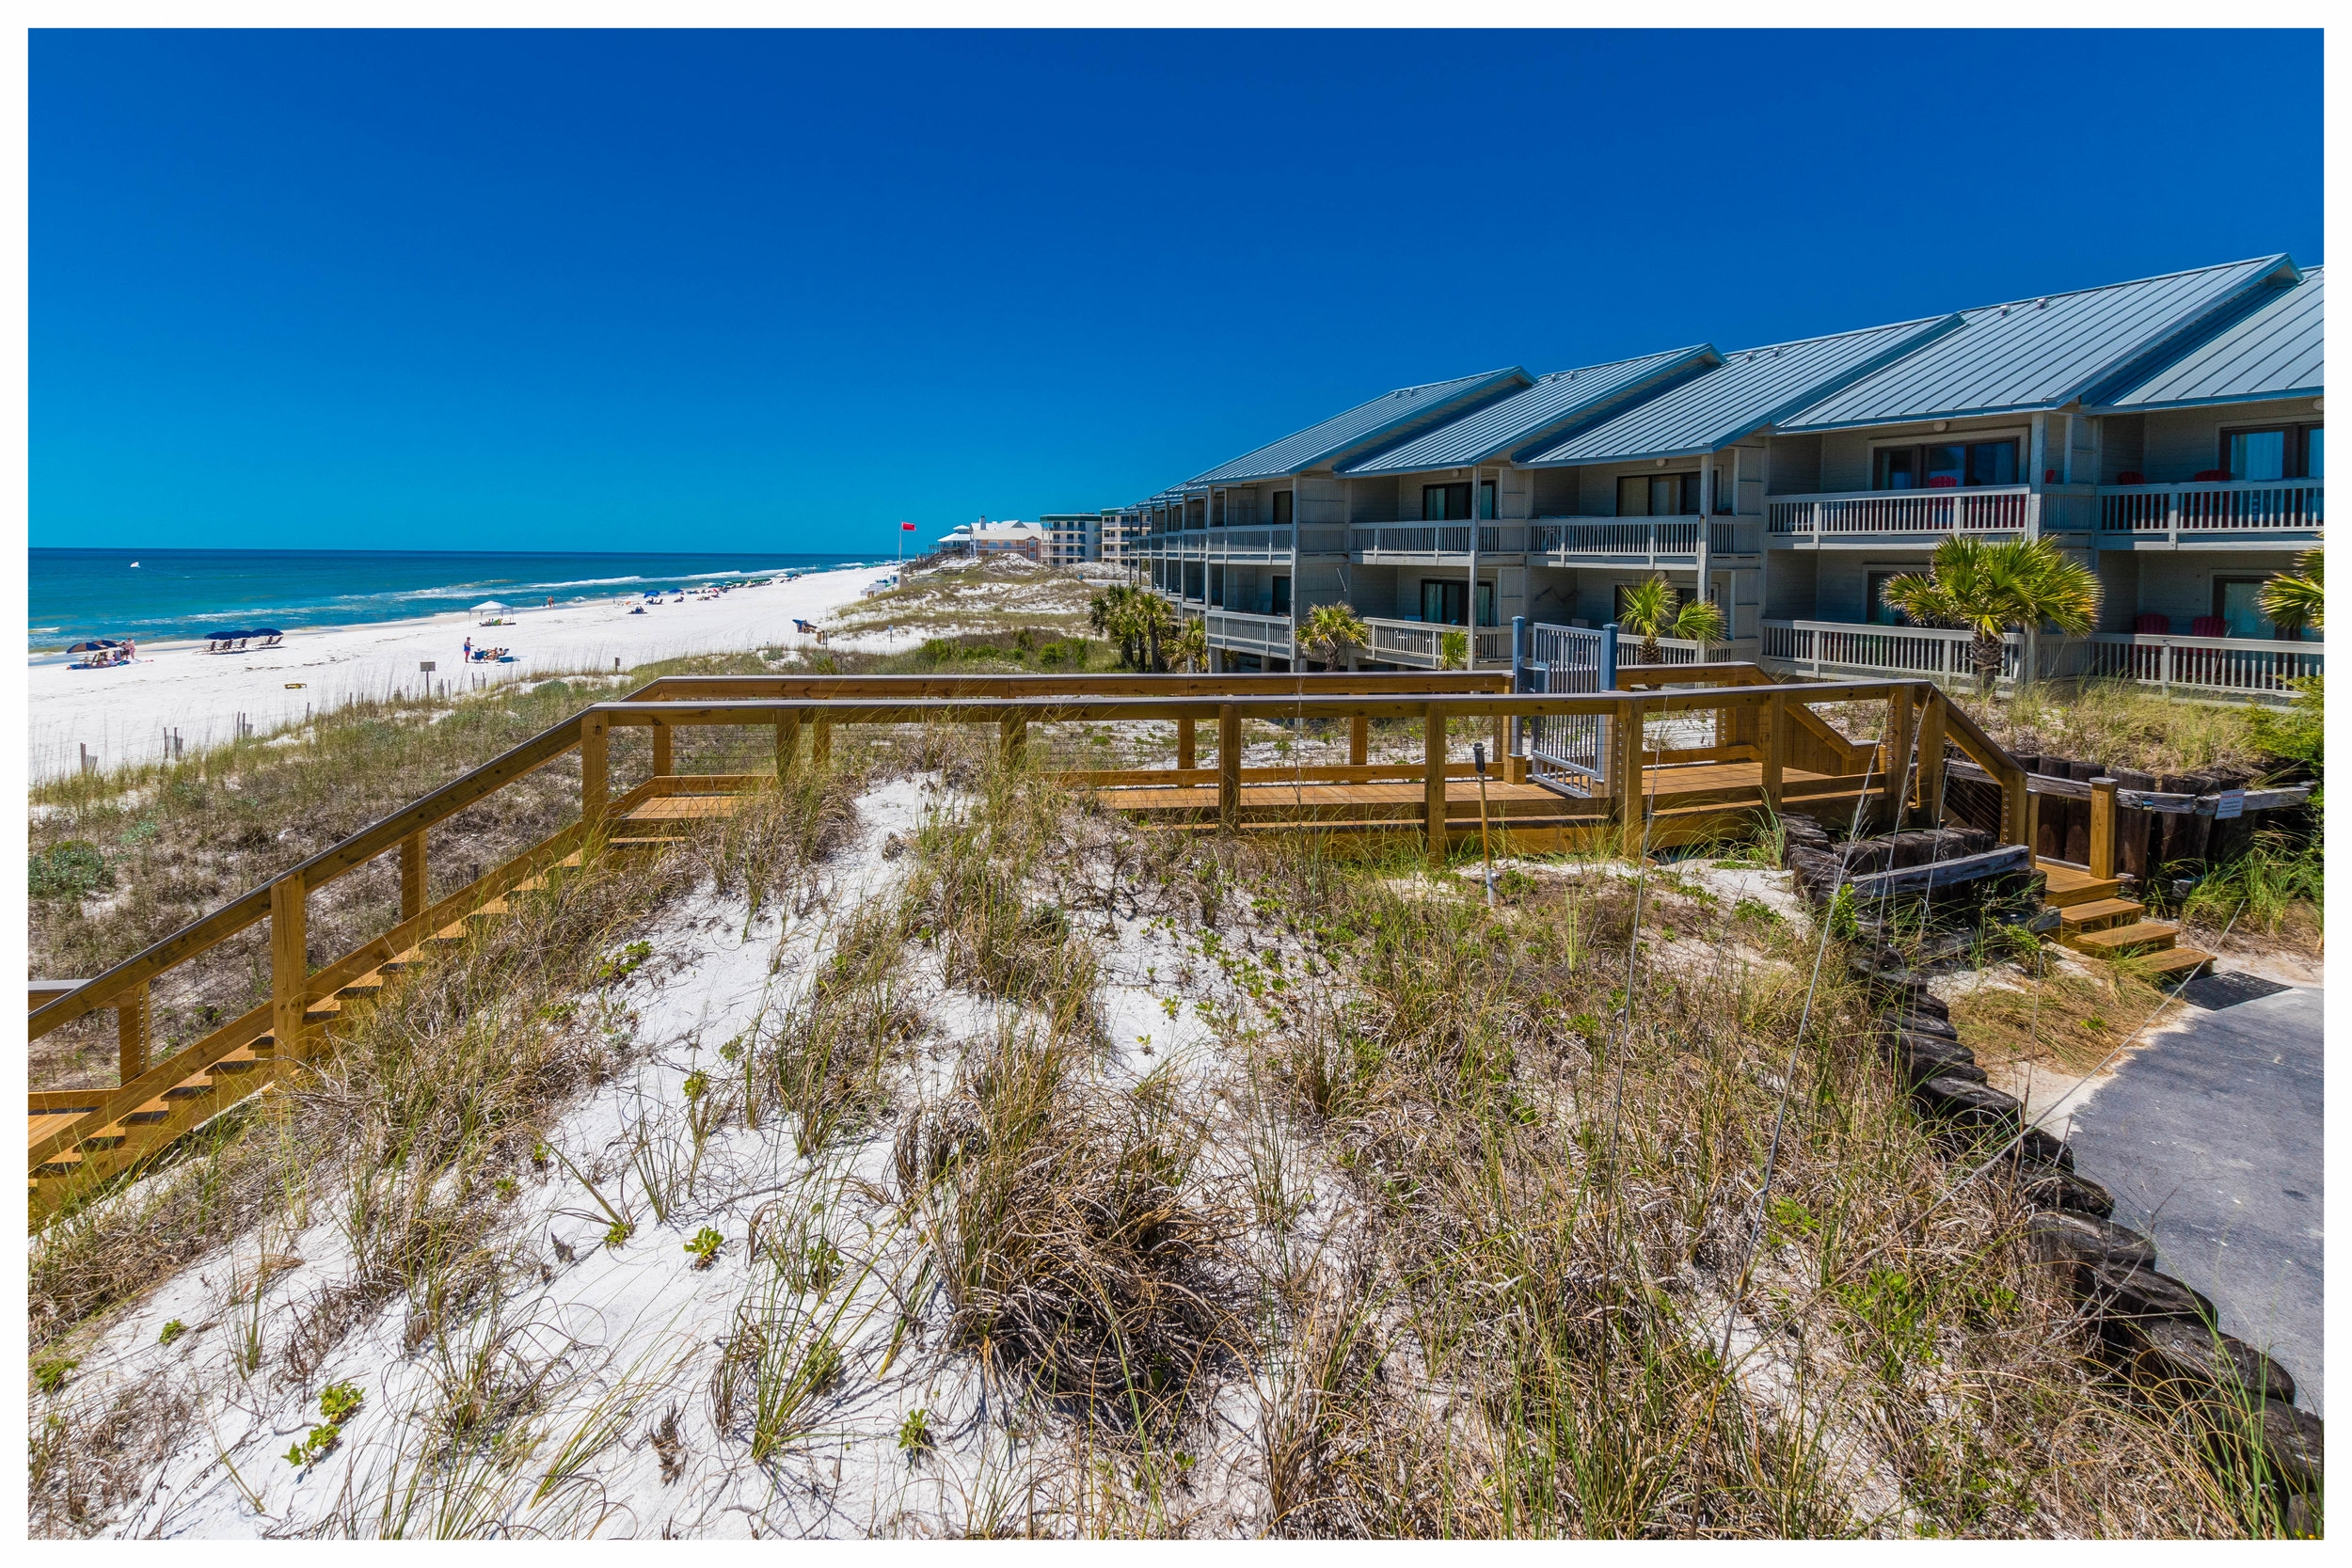 Beach Boardwalk Design and Construction